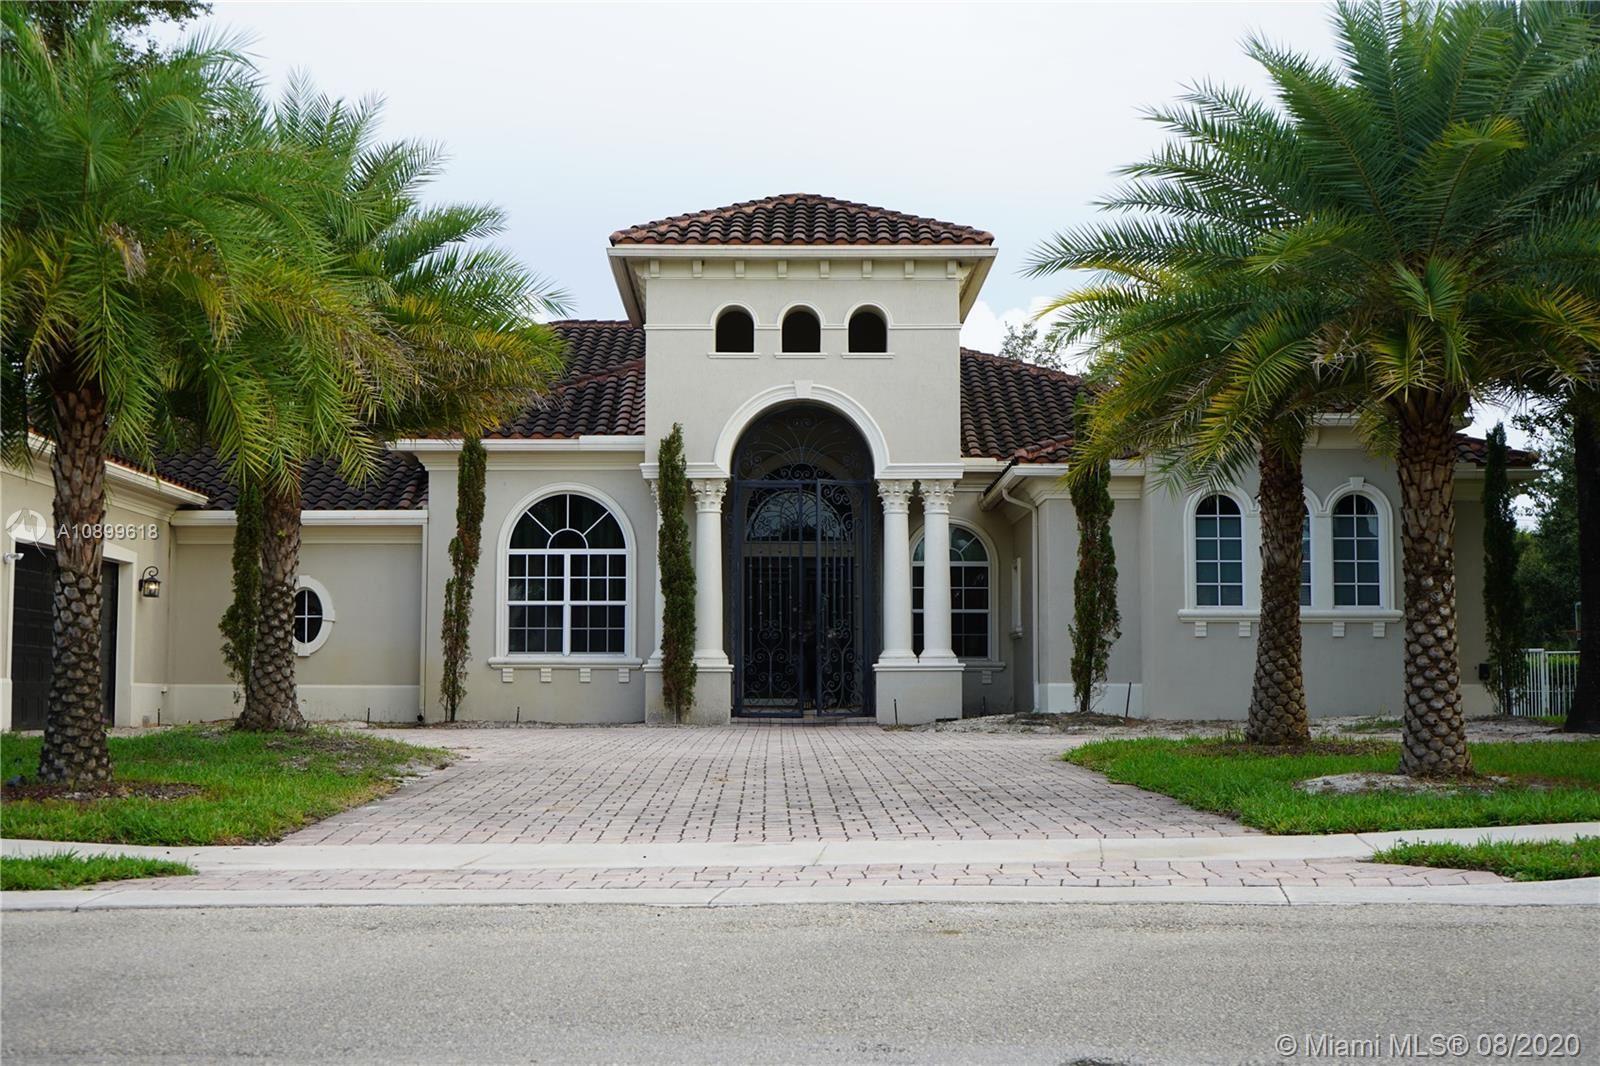 12922 Grand Oaks Dr, Davie, FL 33330 - #: A10899618